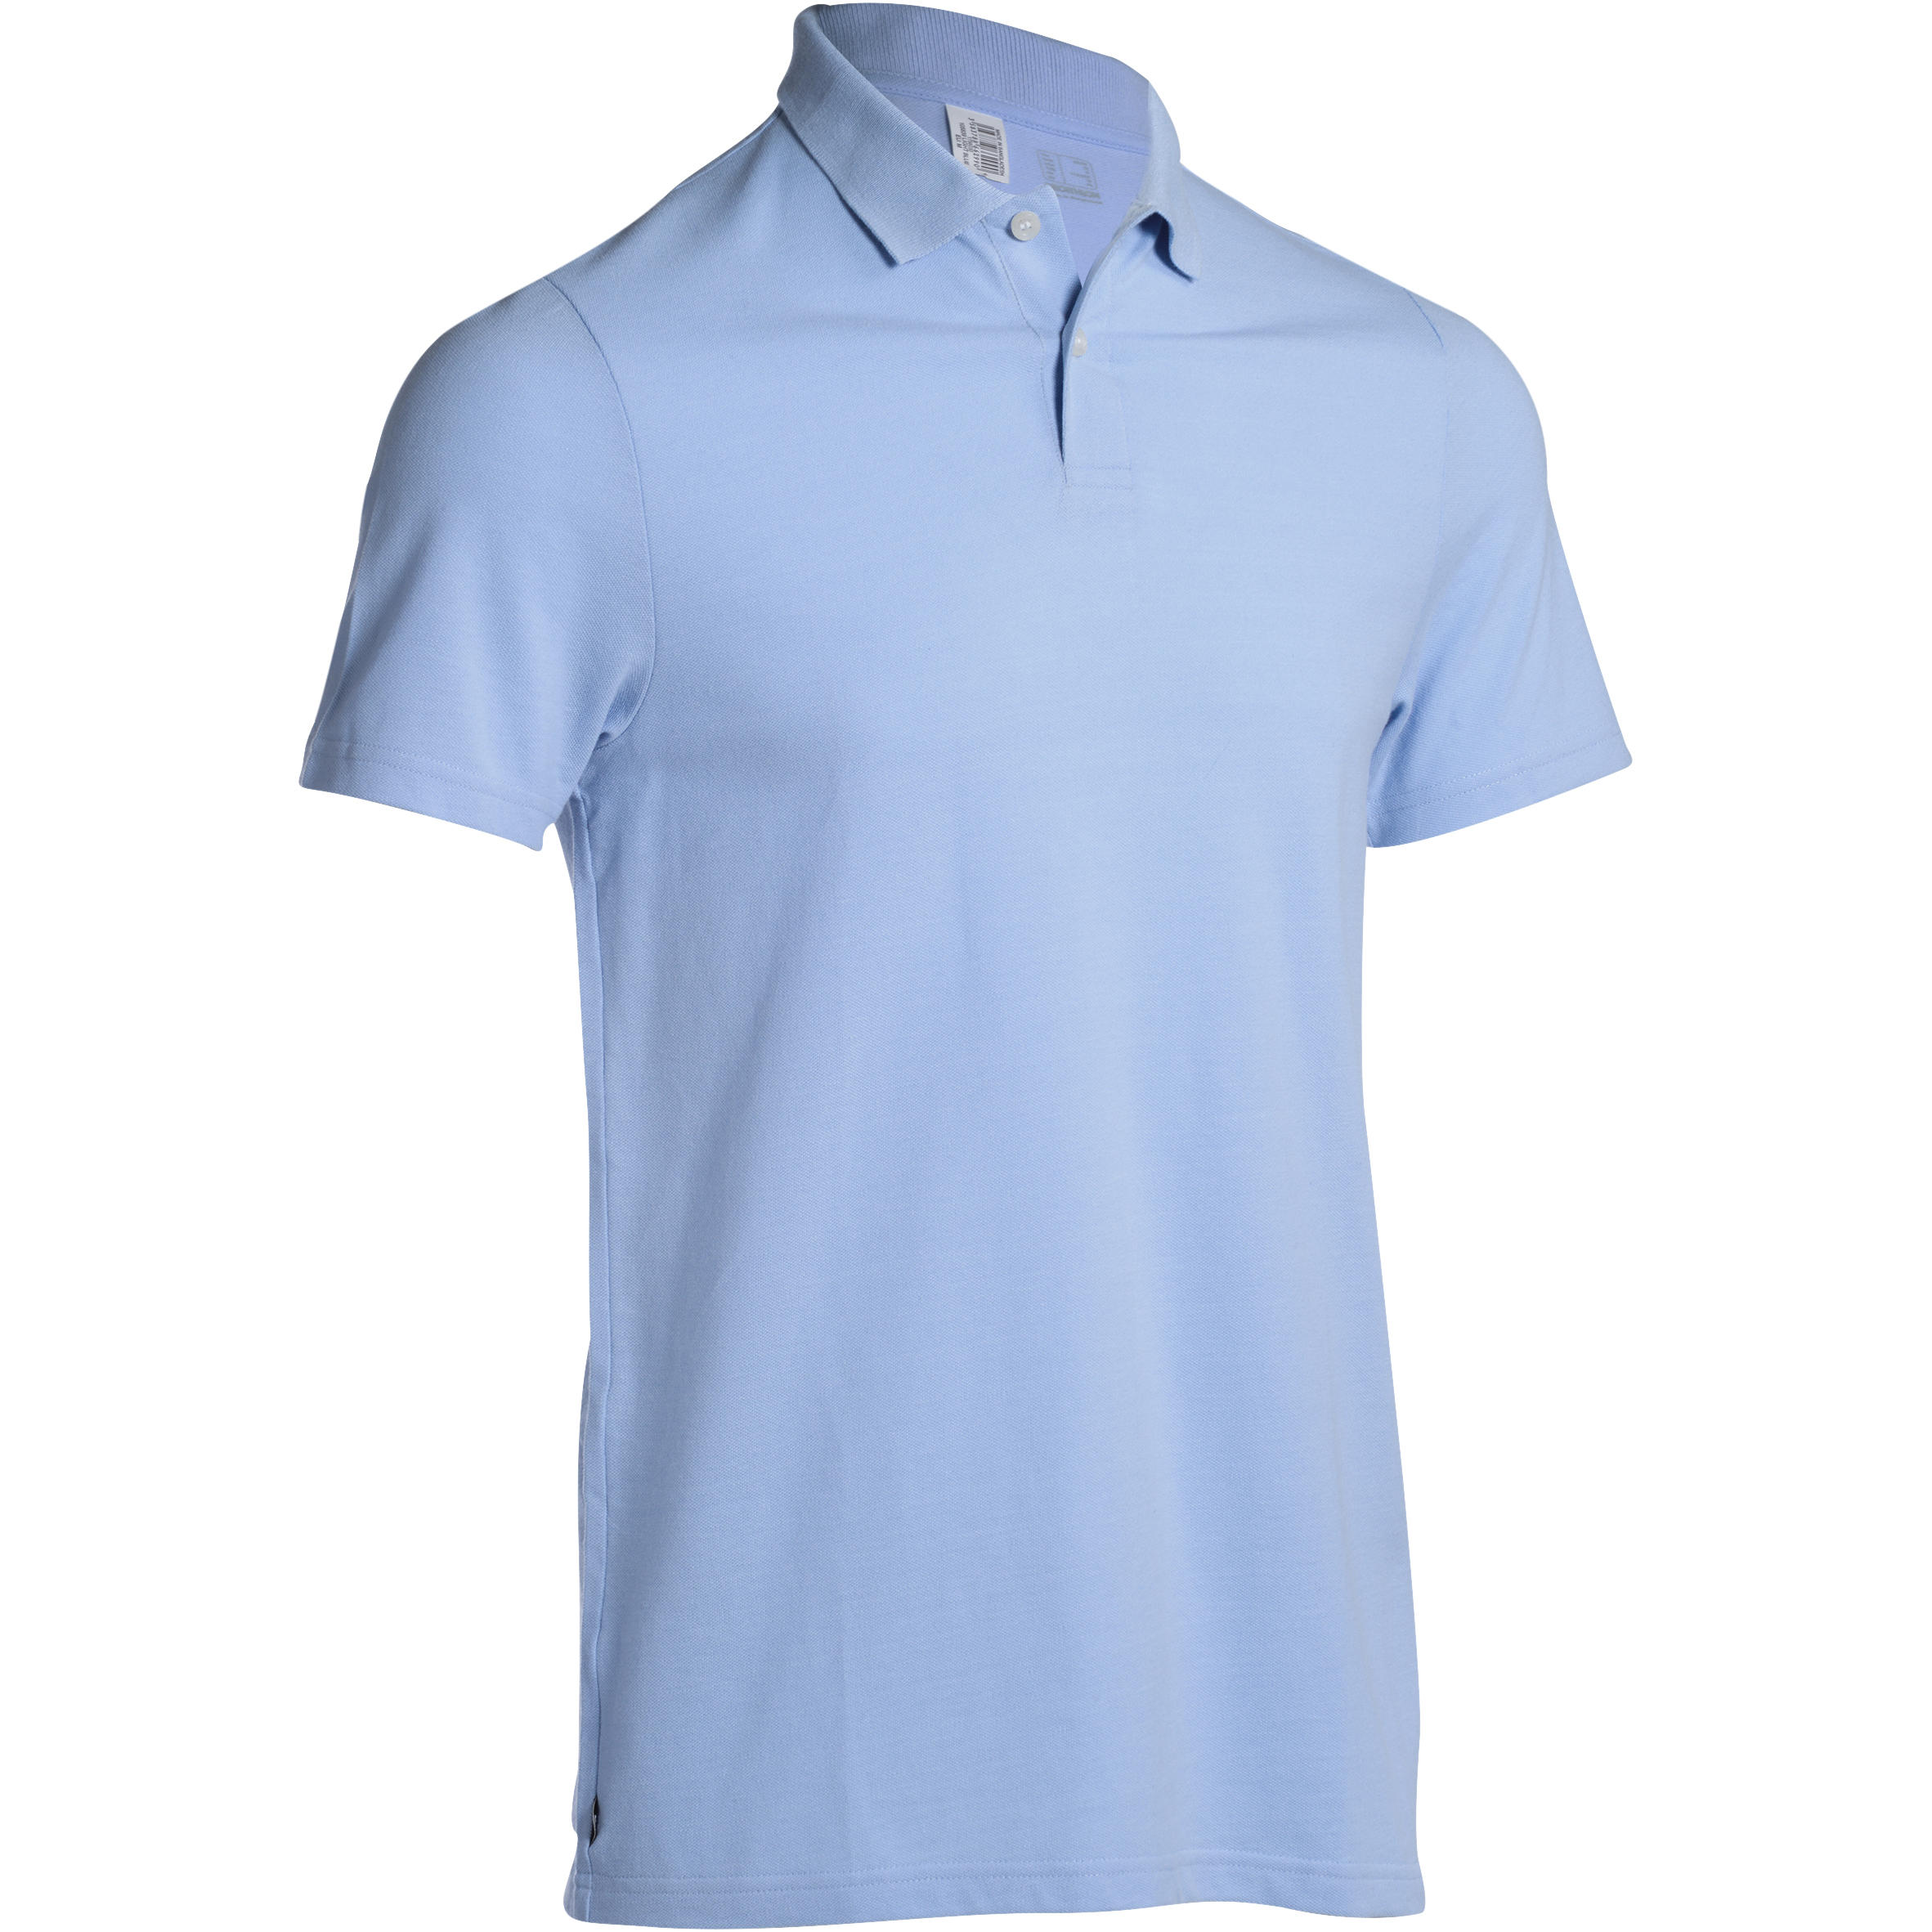 MEN'S GOLF POLO T-SHIRT 100 - SKY BLUE